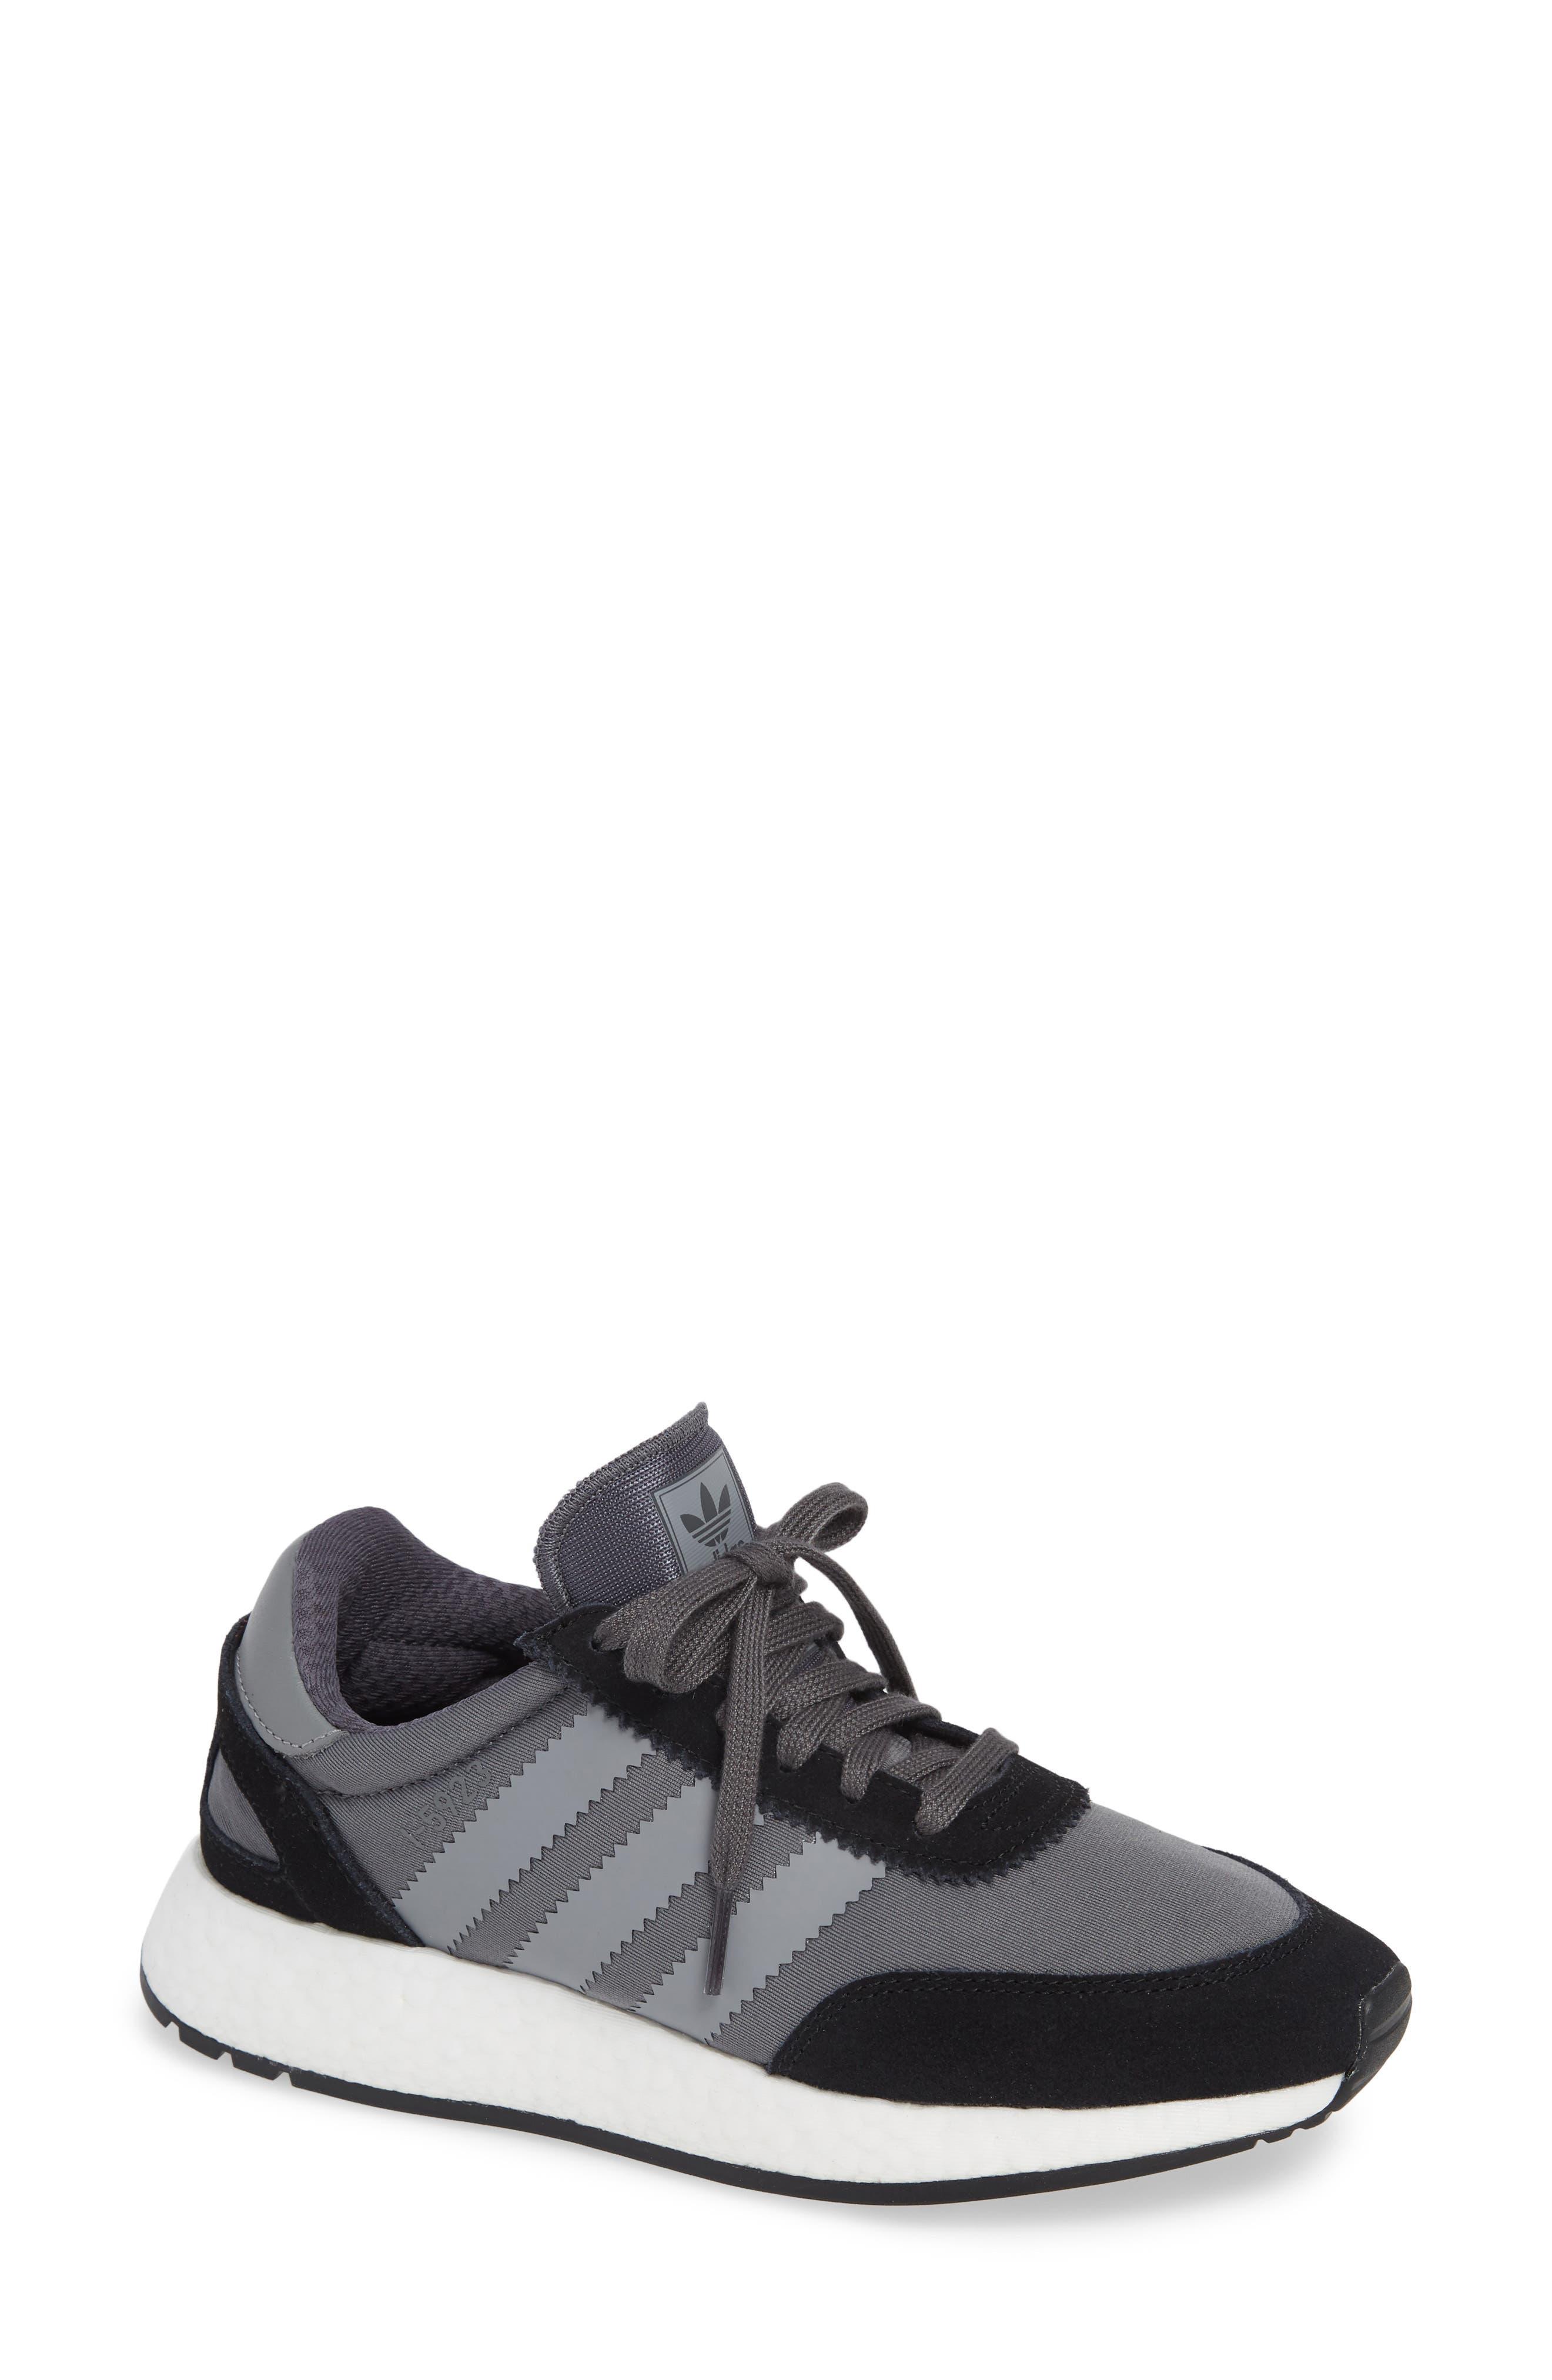 I-5923 Sneaker,                             Main thumbnail 1, color,                             BLACK/ GREY THREE/ GREY FIVE